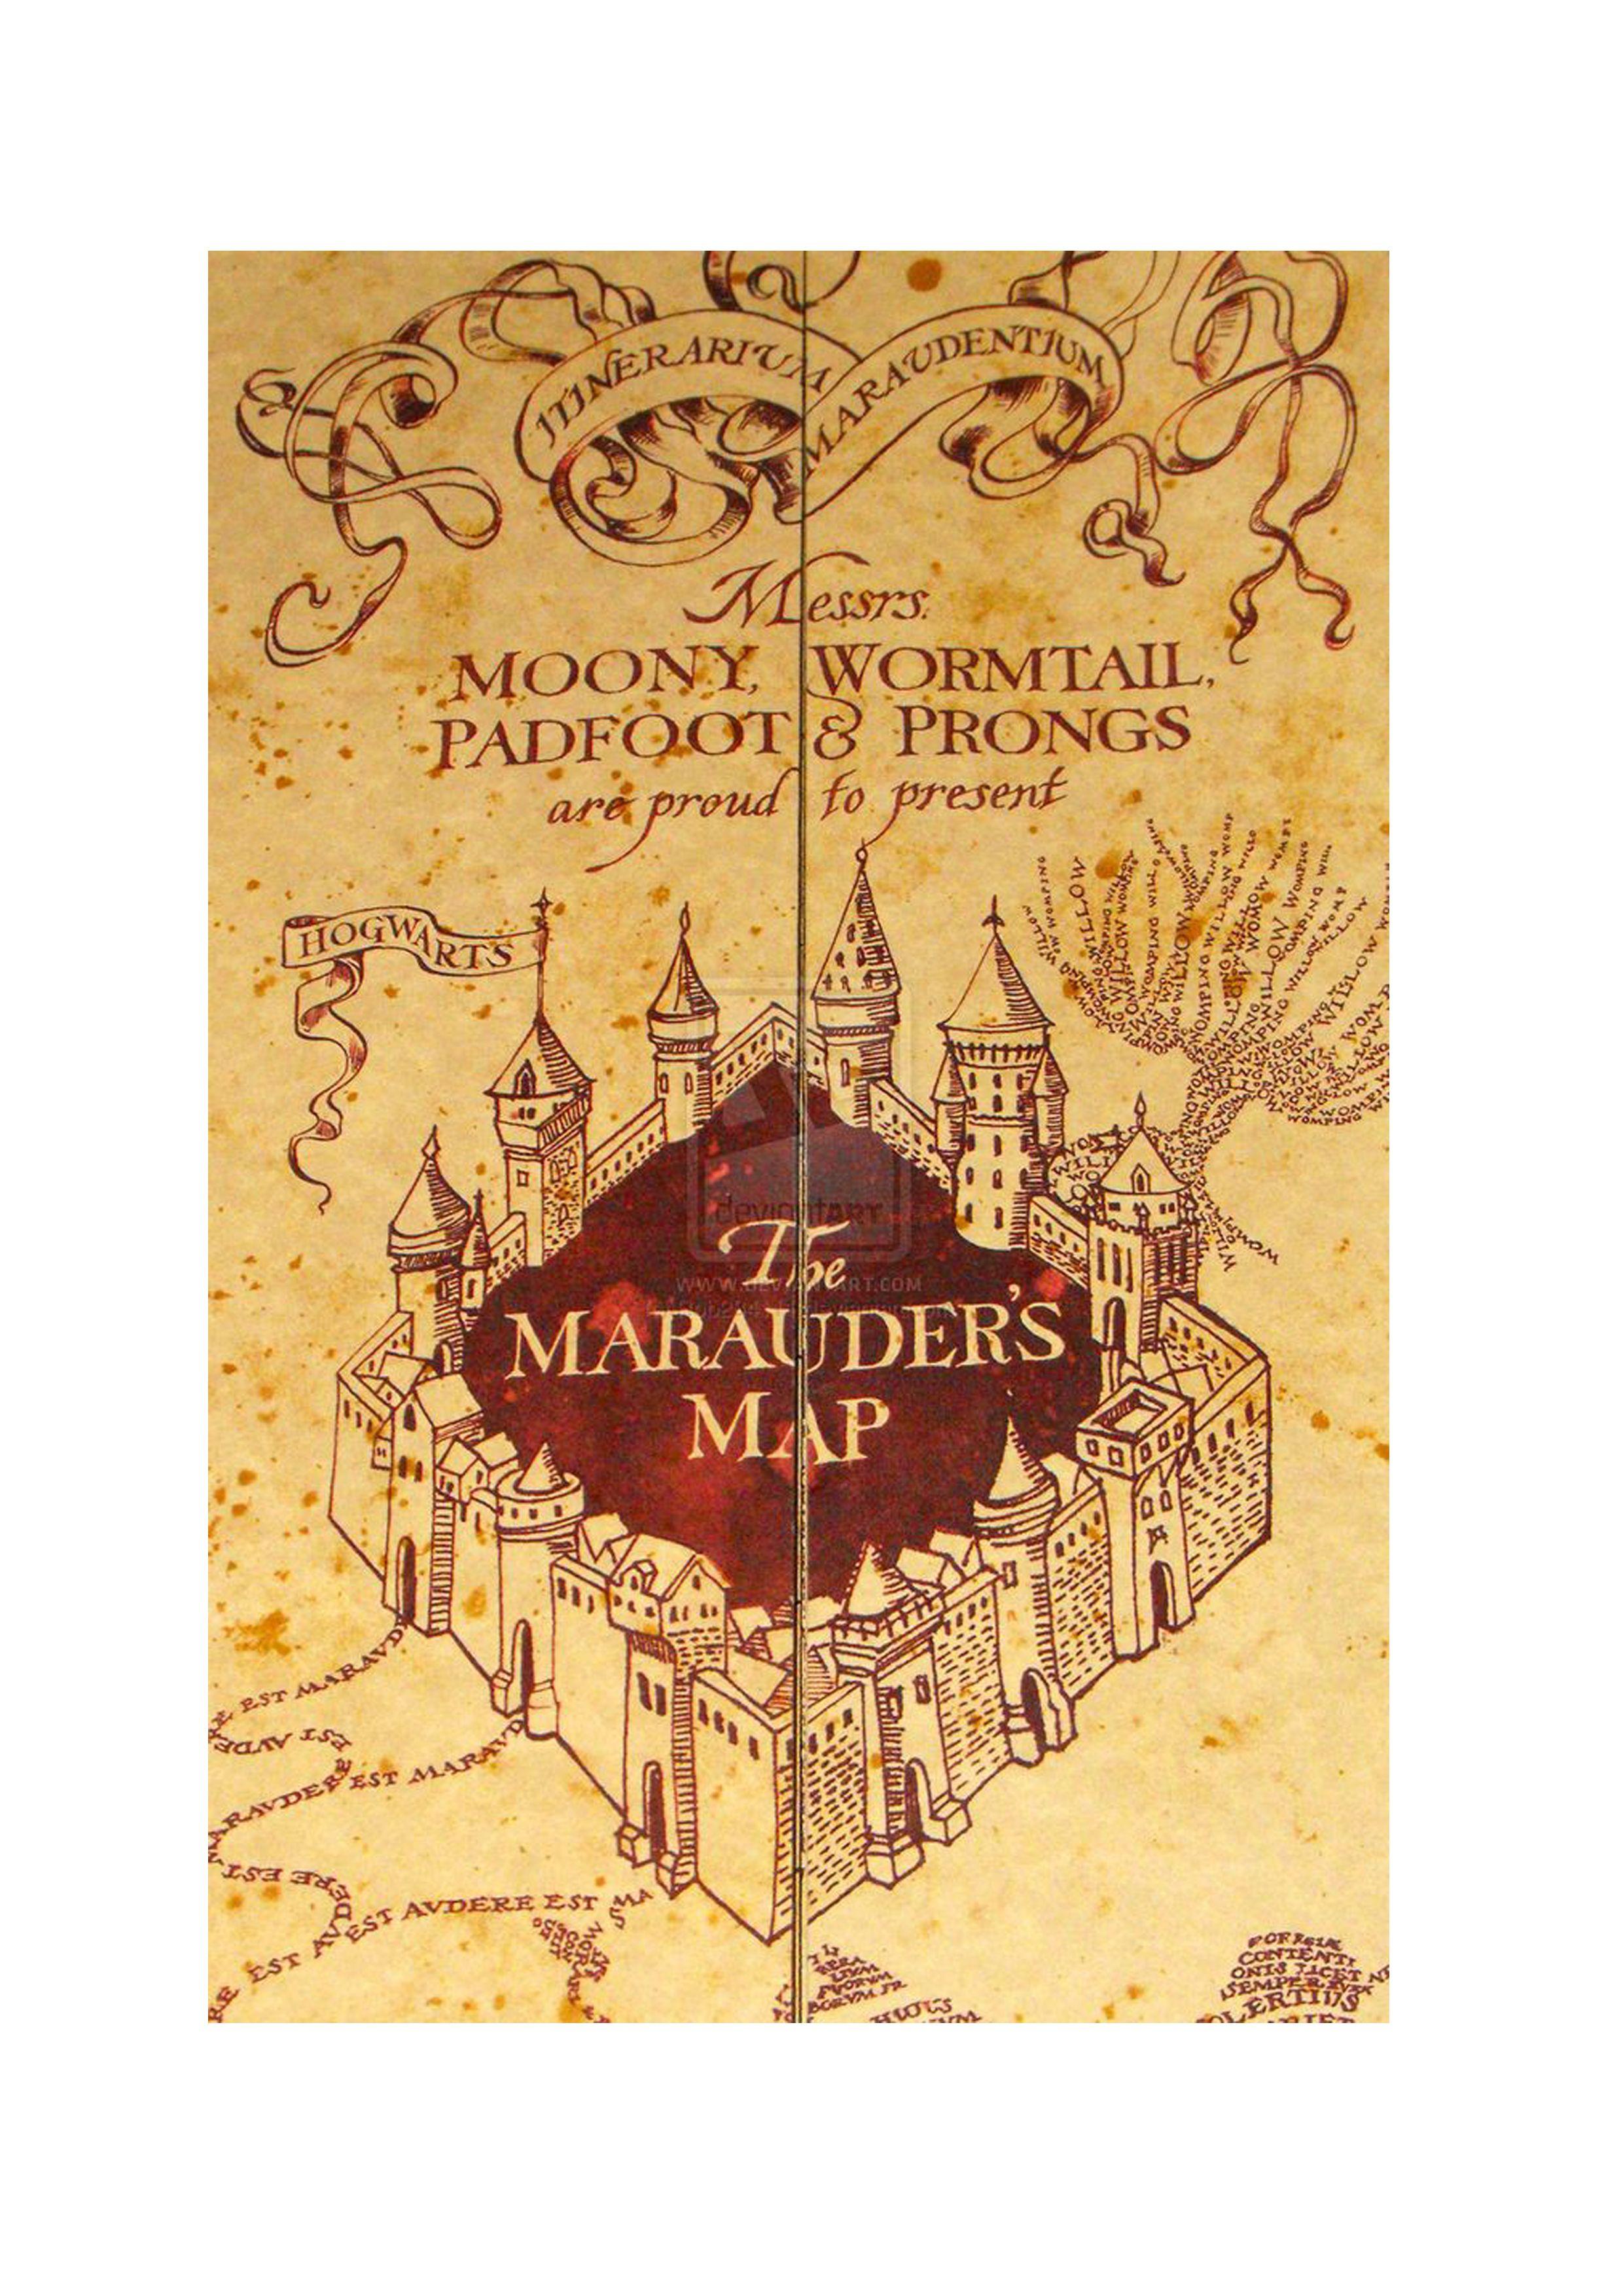 bb94c386ee260 Harry Potter World Map, Harry Potter Films, Harry Potter Spell Book, Harry  Potter